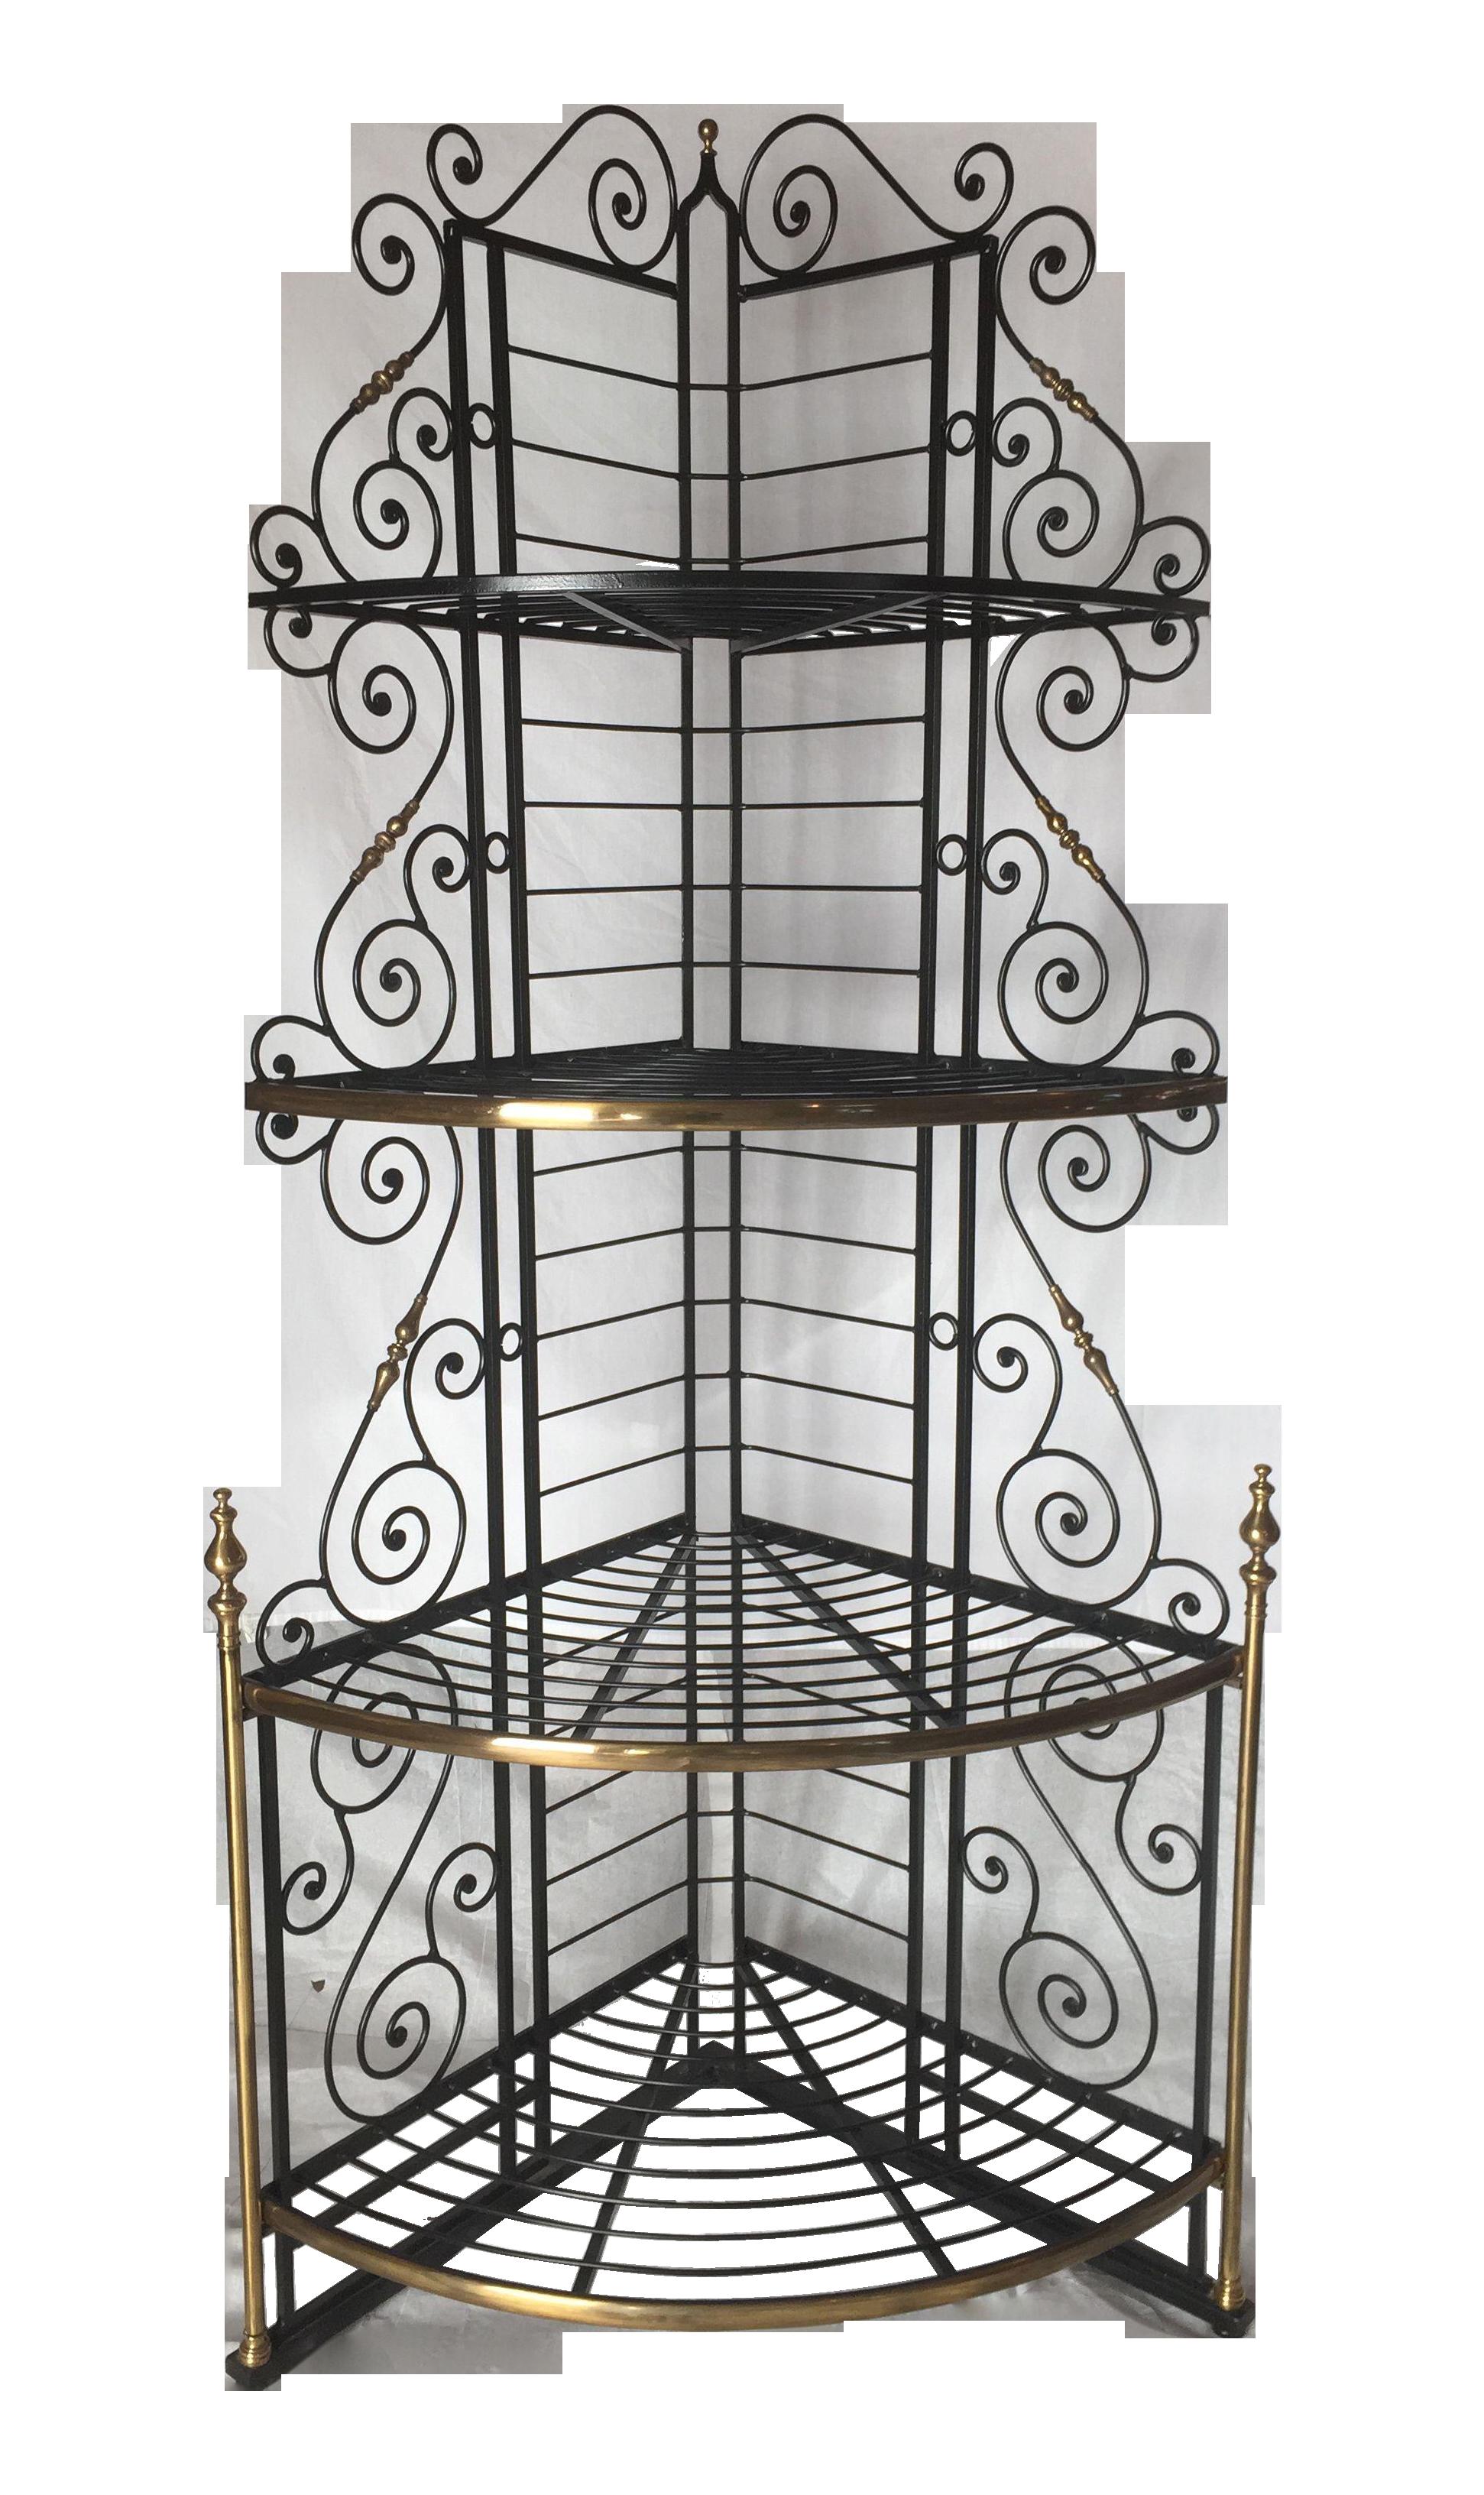 Vintage French Brass Loft Decor French Vintage Wrought Iron Gates